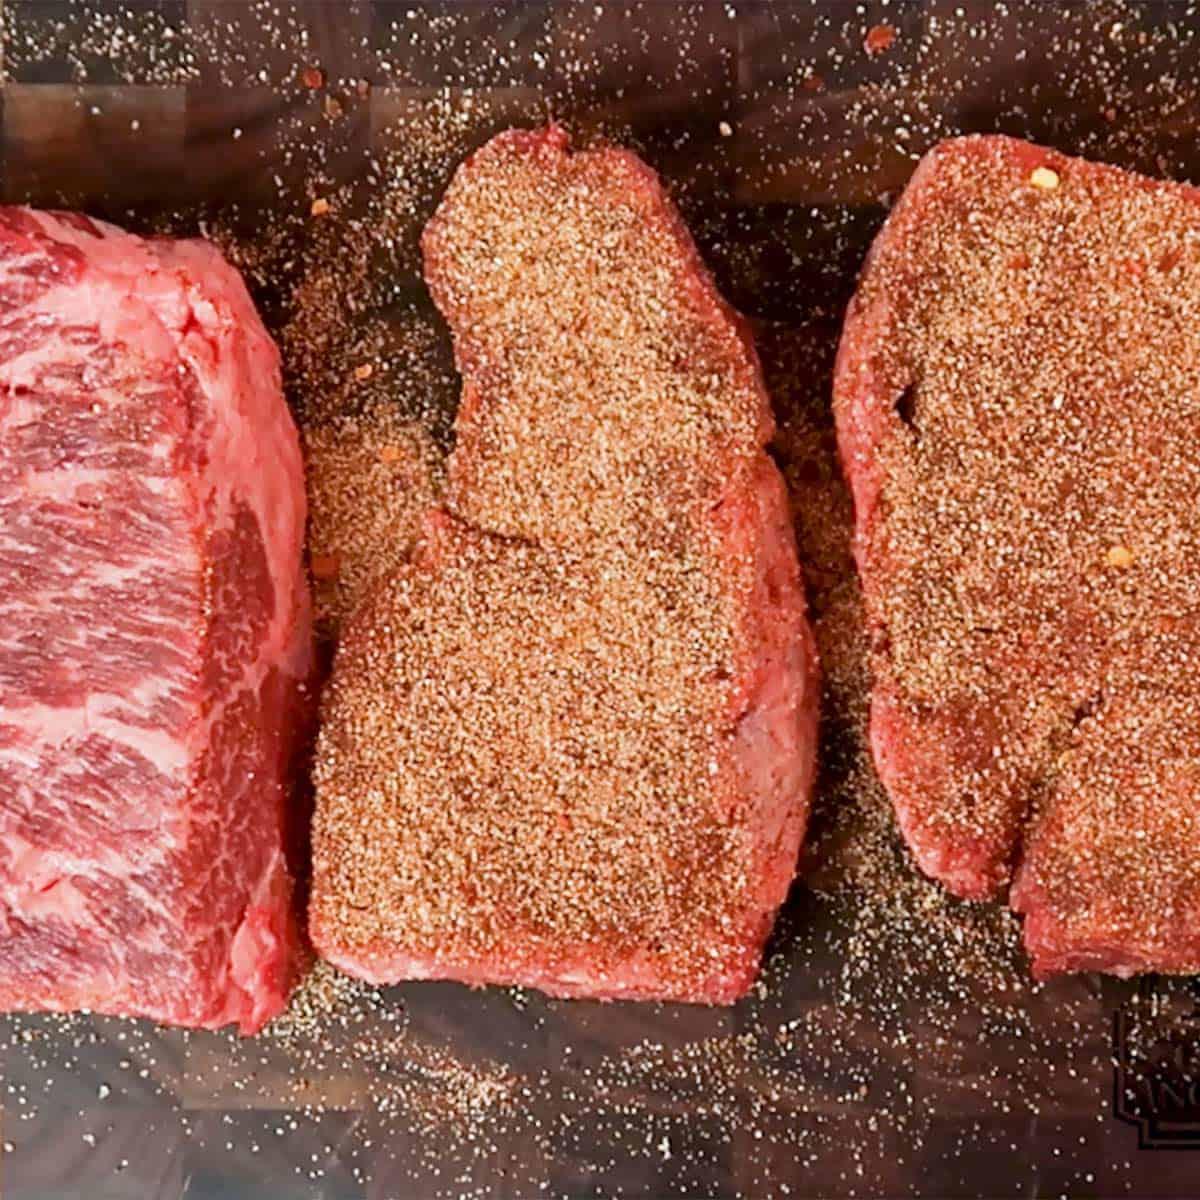 Three seasoned steaks on a cutting board